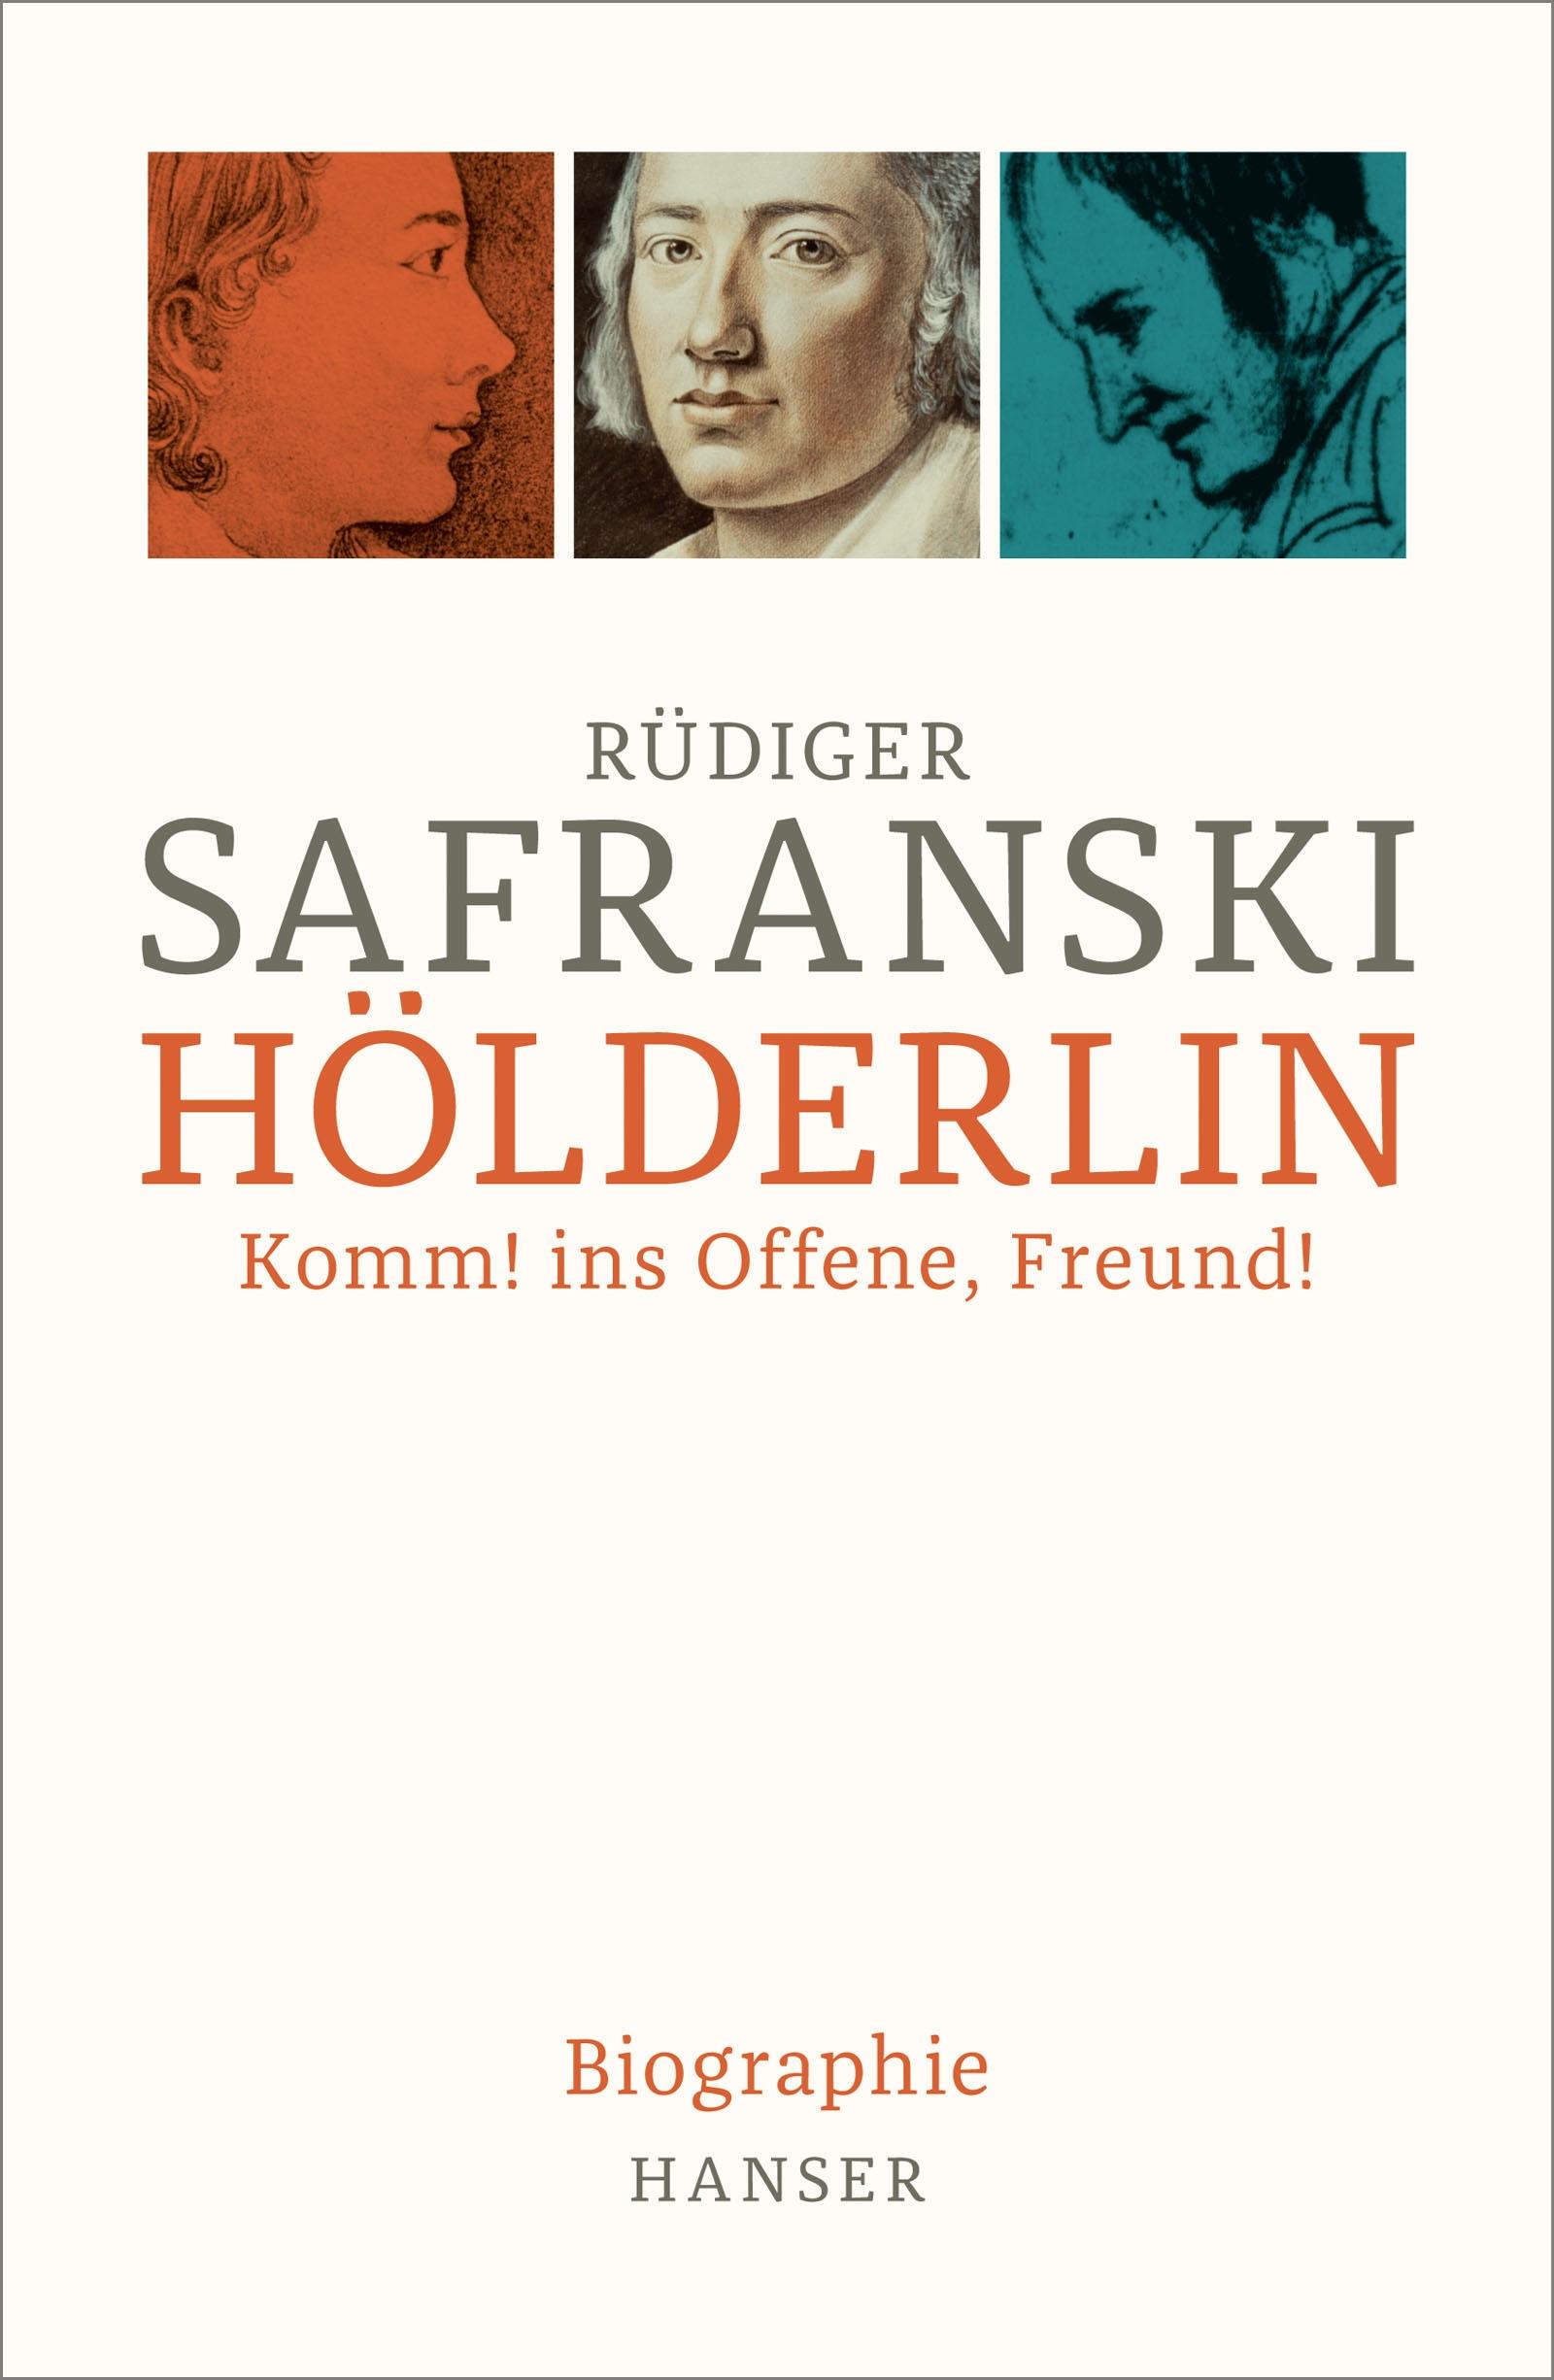 Bildergebnis für Rüdiger Safranski Hölderlin